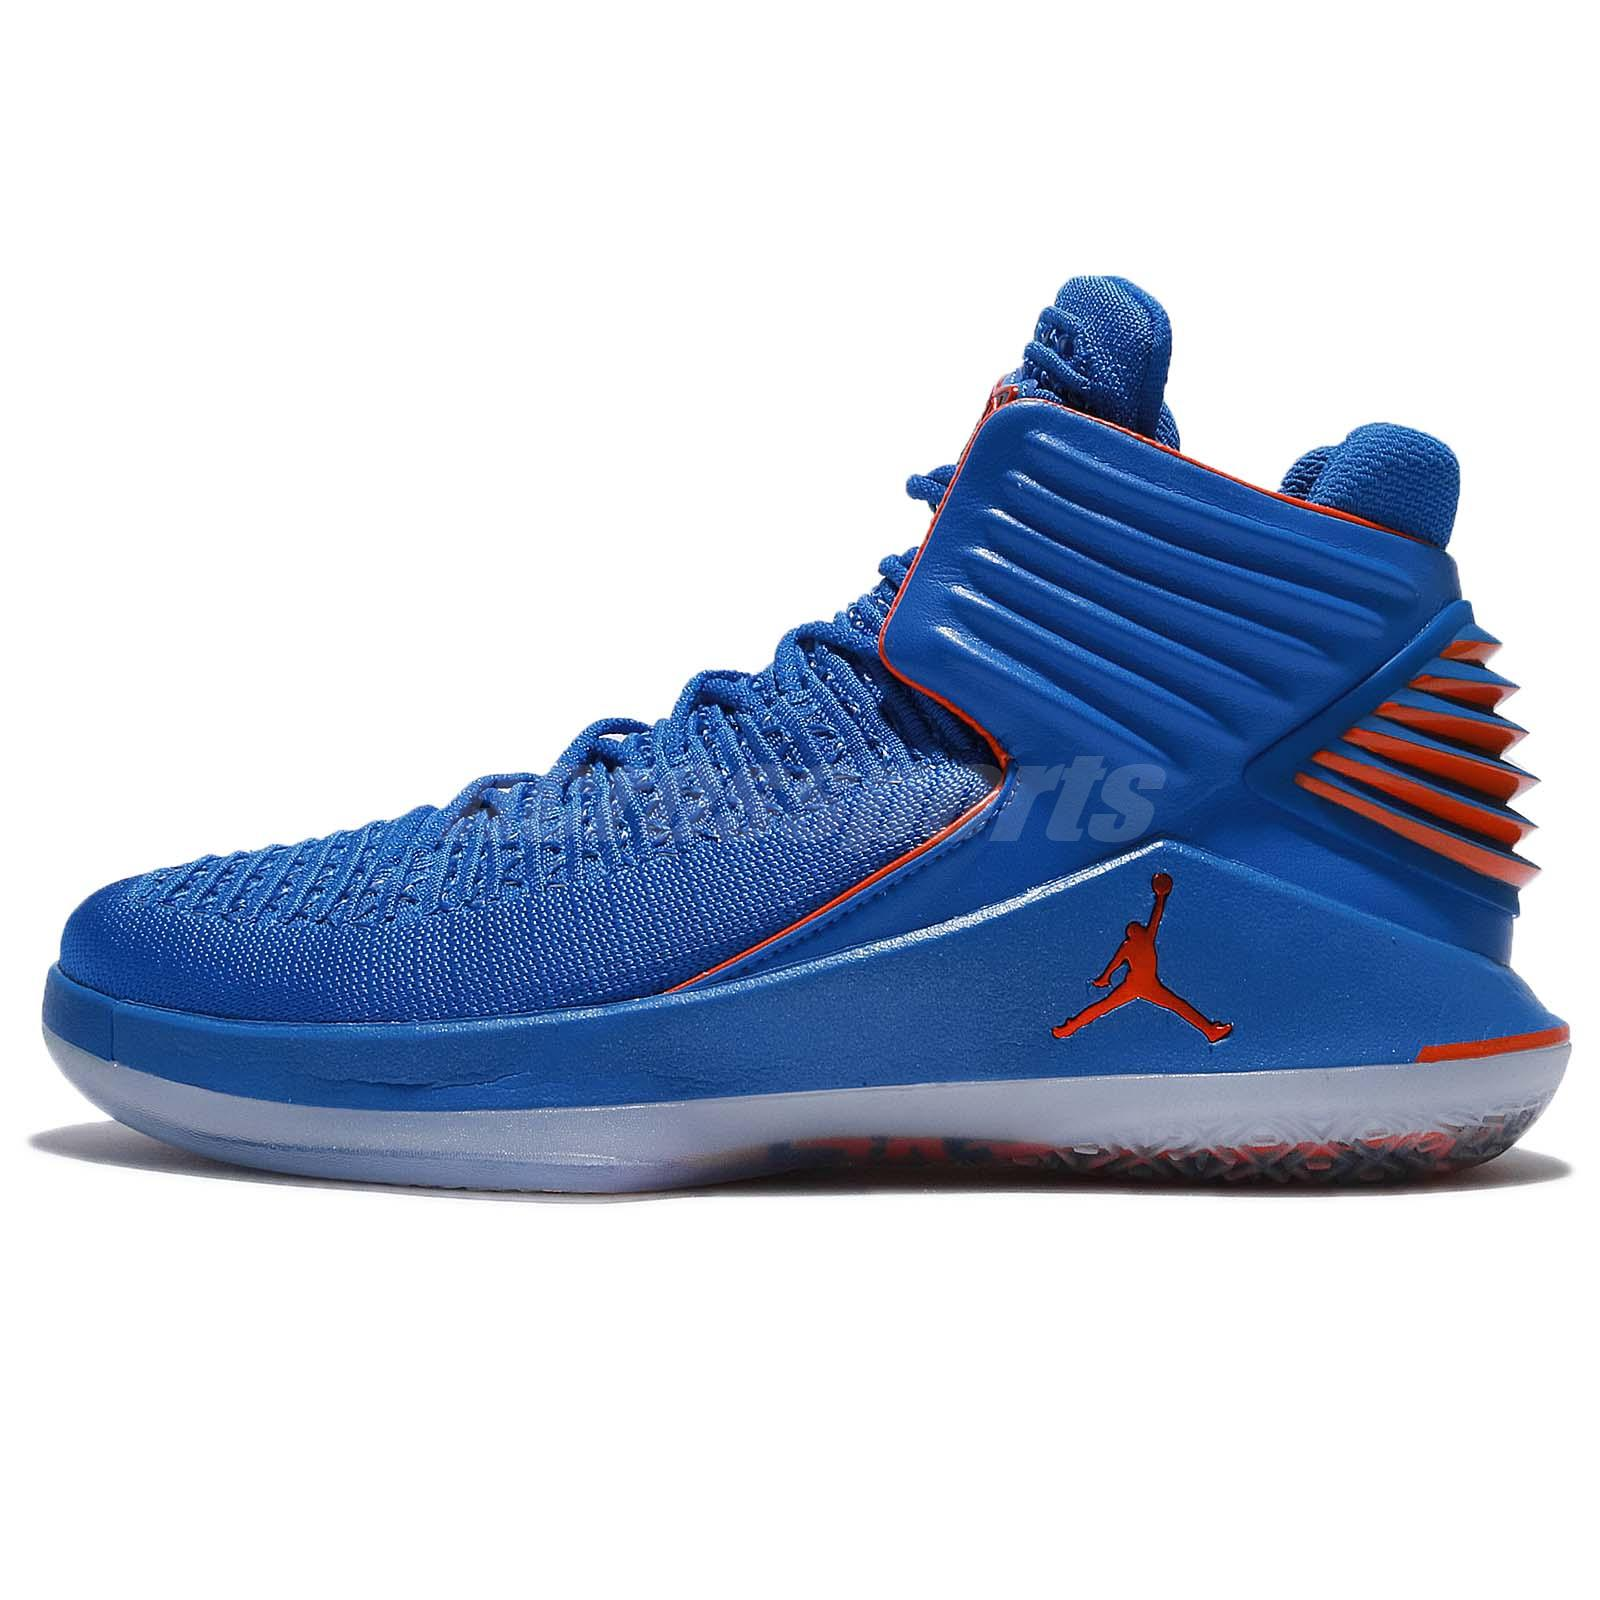 831a995fc6e3 Nike Air Jordan XXXII PF 32 AJ32 Blue Orange Men Shoes Sneakers AH3348-400